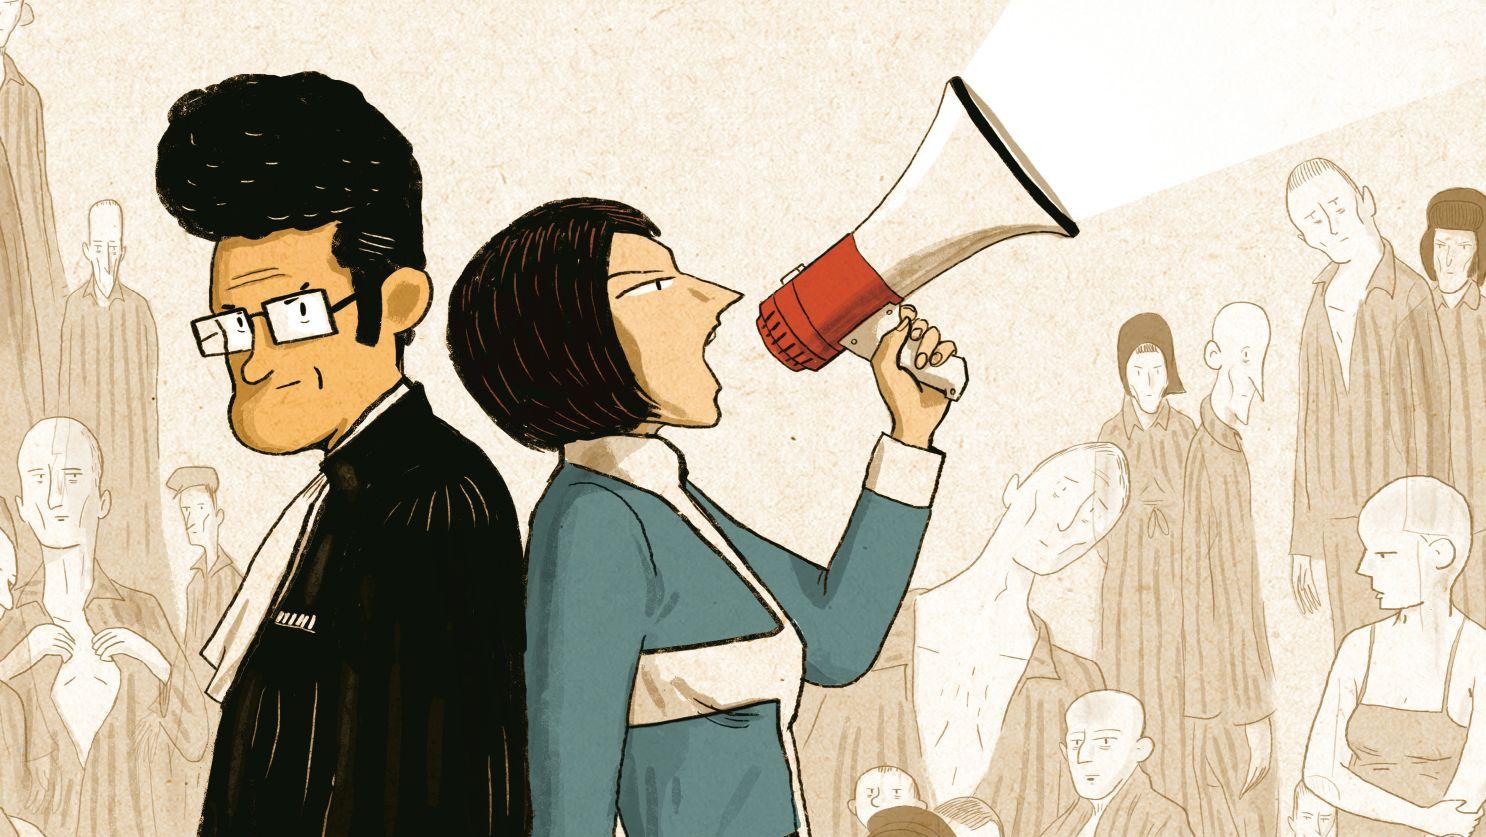 Lautstarker Kampf gegen das Vergessen: Beate und Serge Klarsfeld im Comic